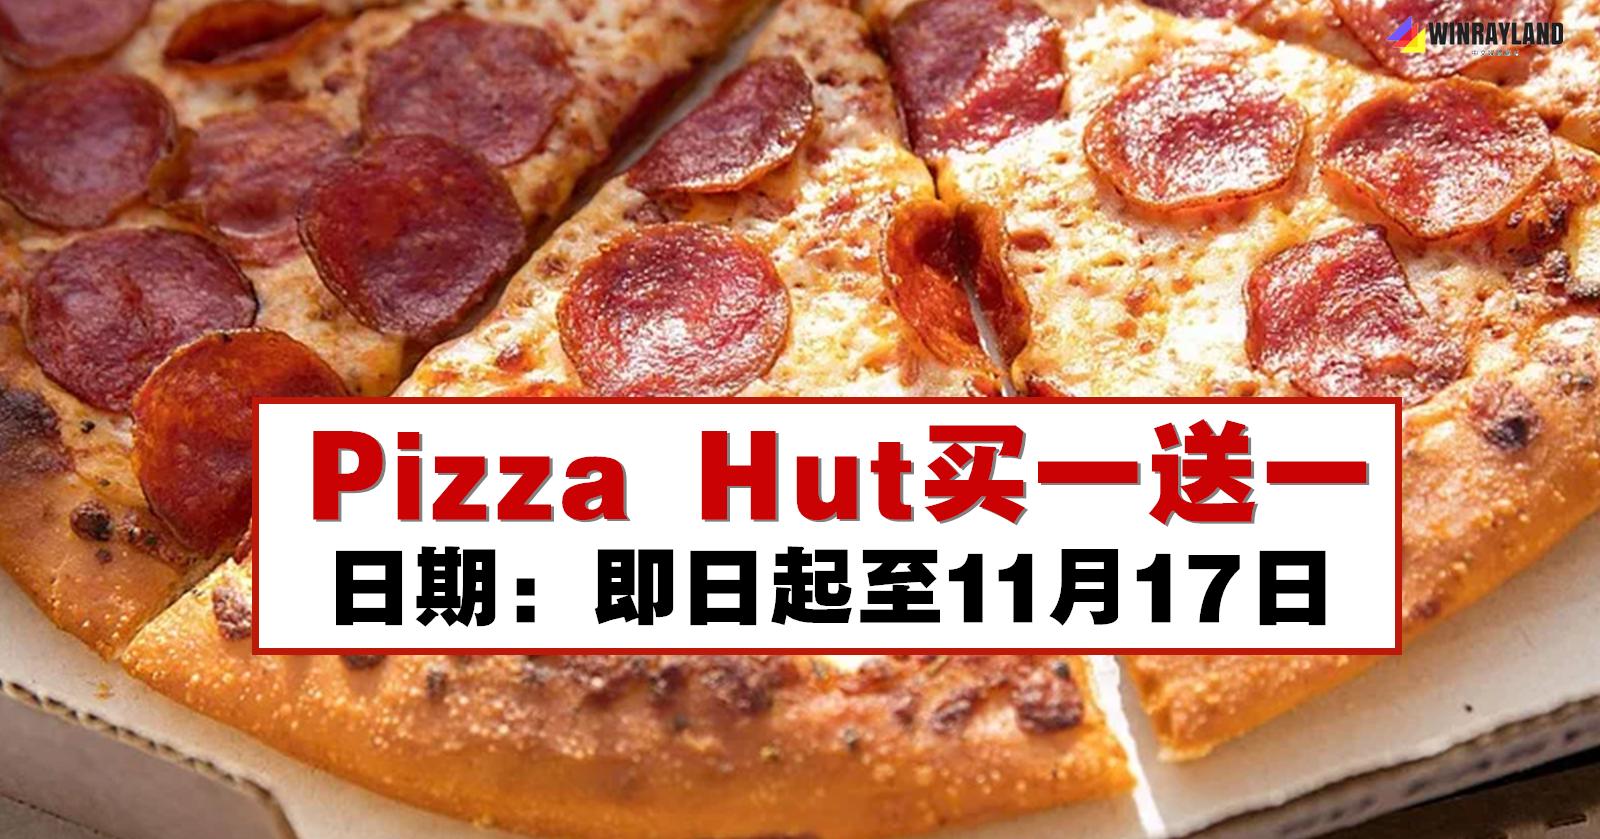 Pizza Hut买一送一